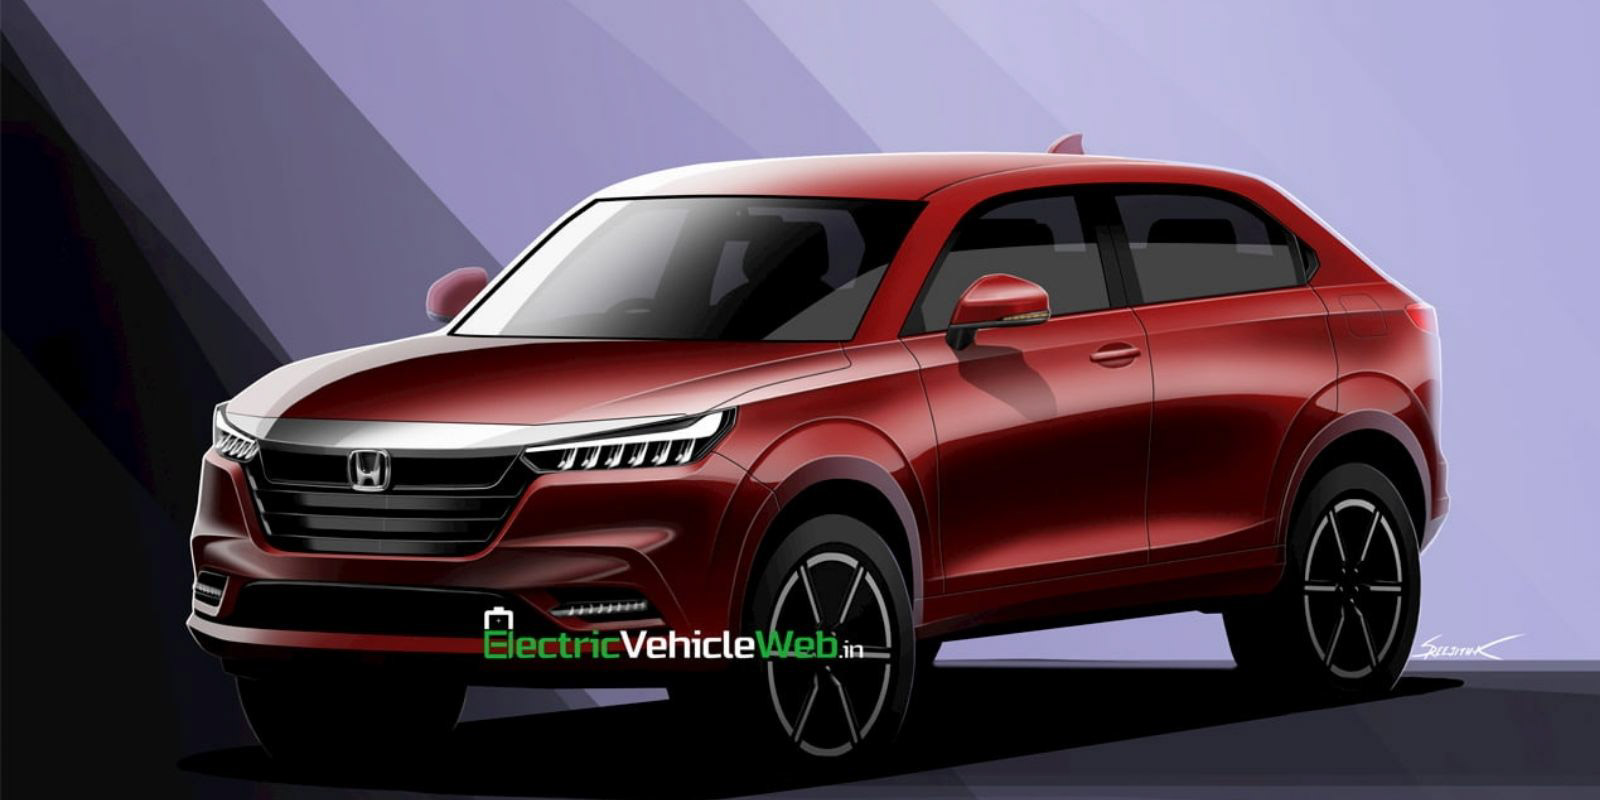 Honda recalls model year 2019 CR-Vs